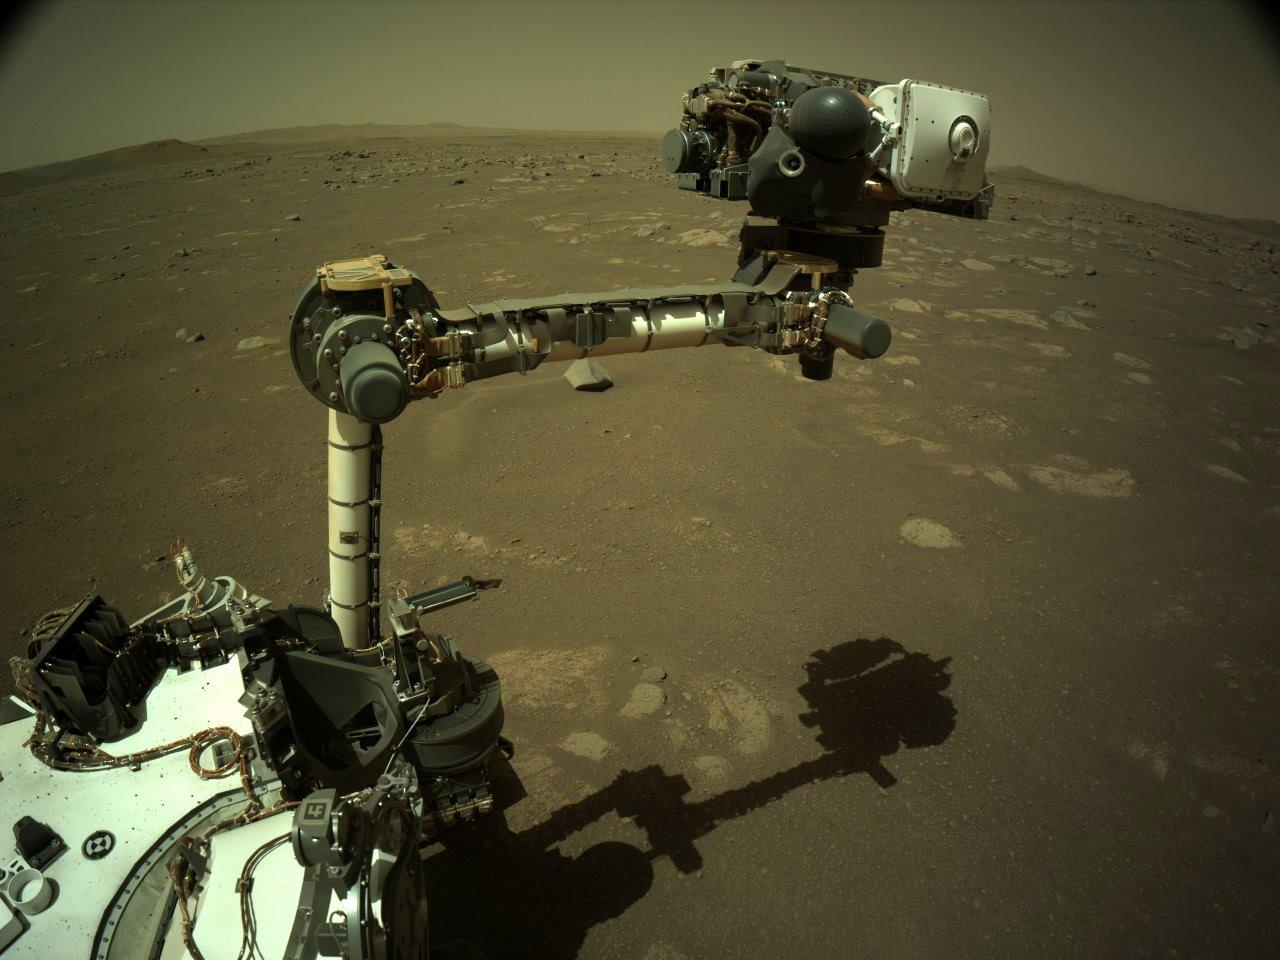 Mars 2020 (Perseverance - Ingenuity) : exploration du cratère Jezero - Page 5 11833